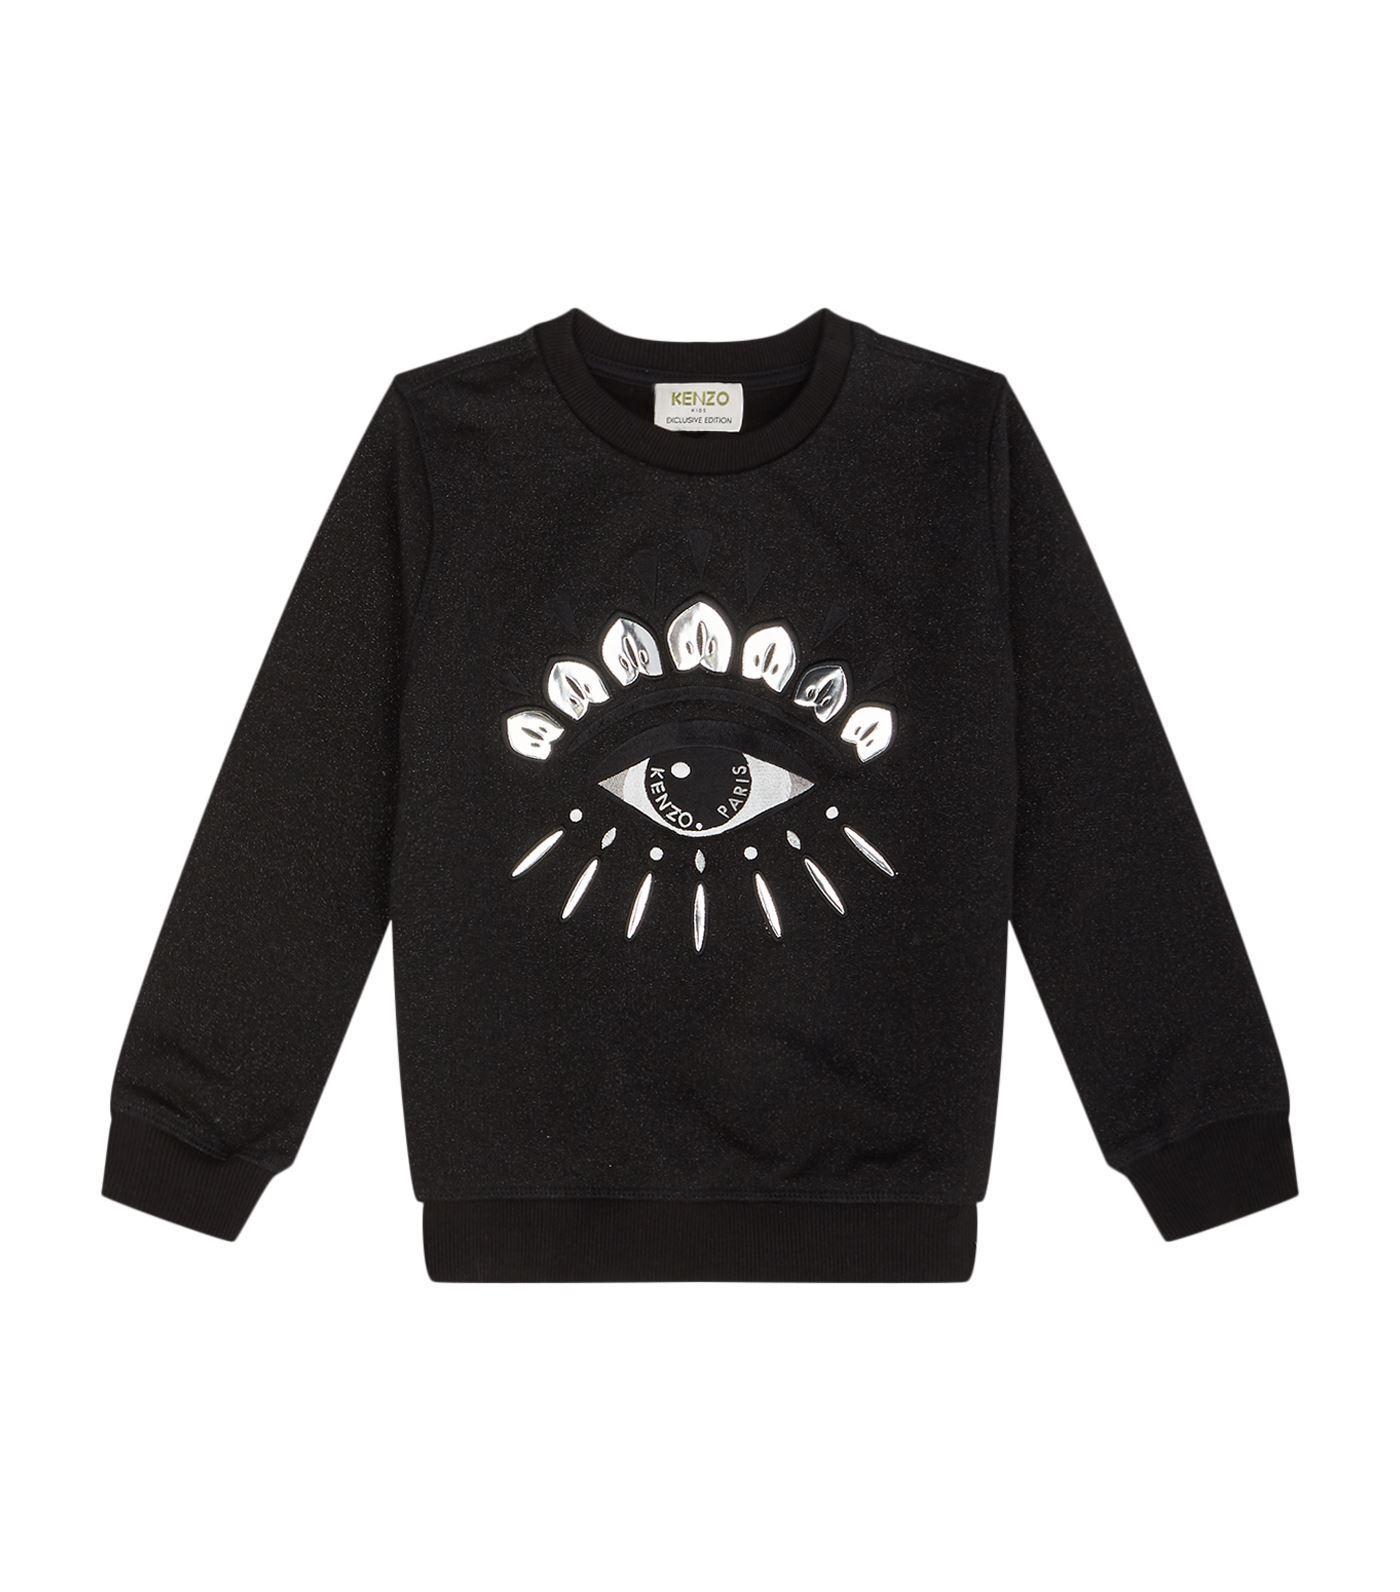 Kenzo Lurex Eye Motif Sweater In Black